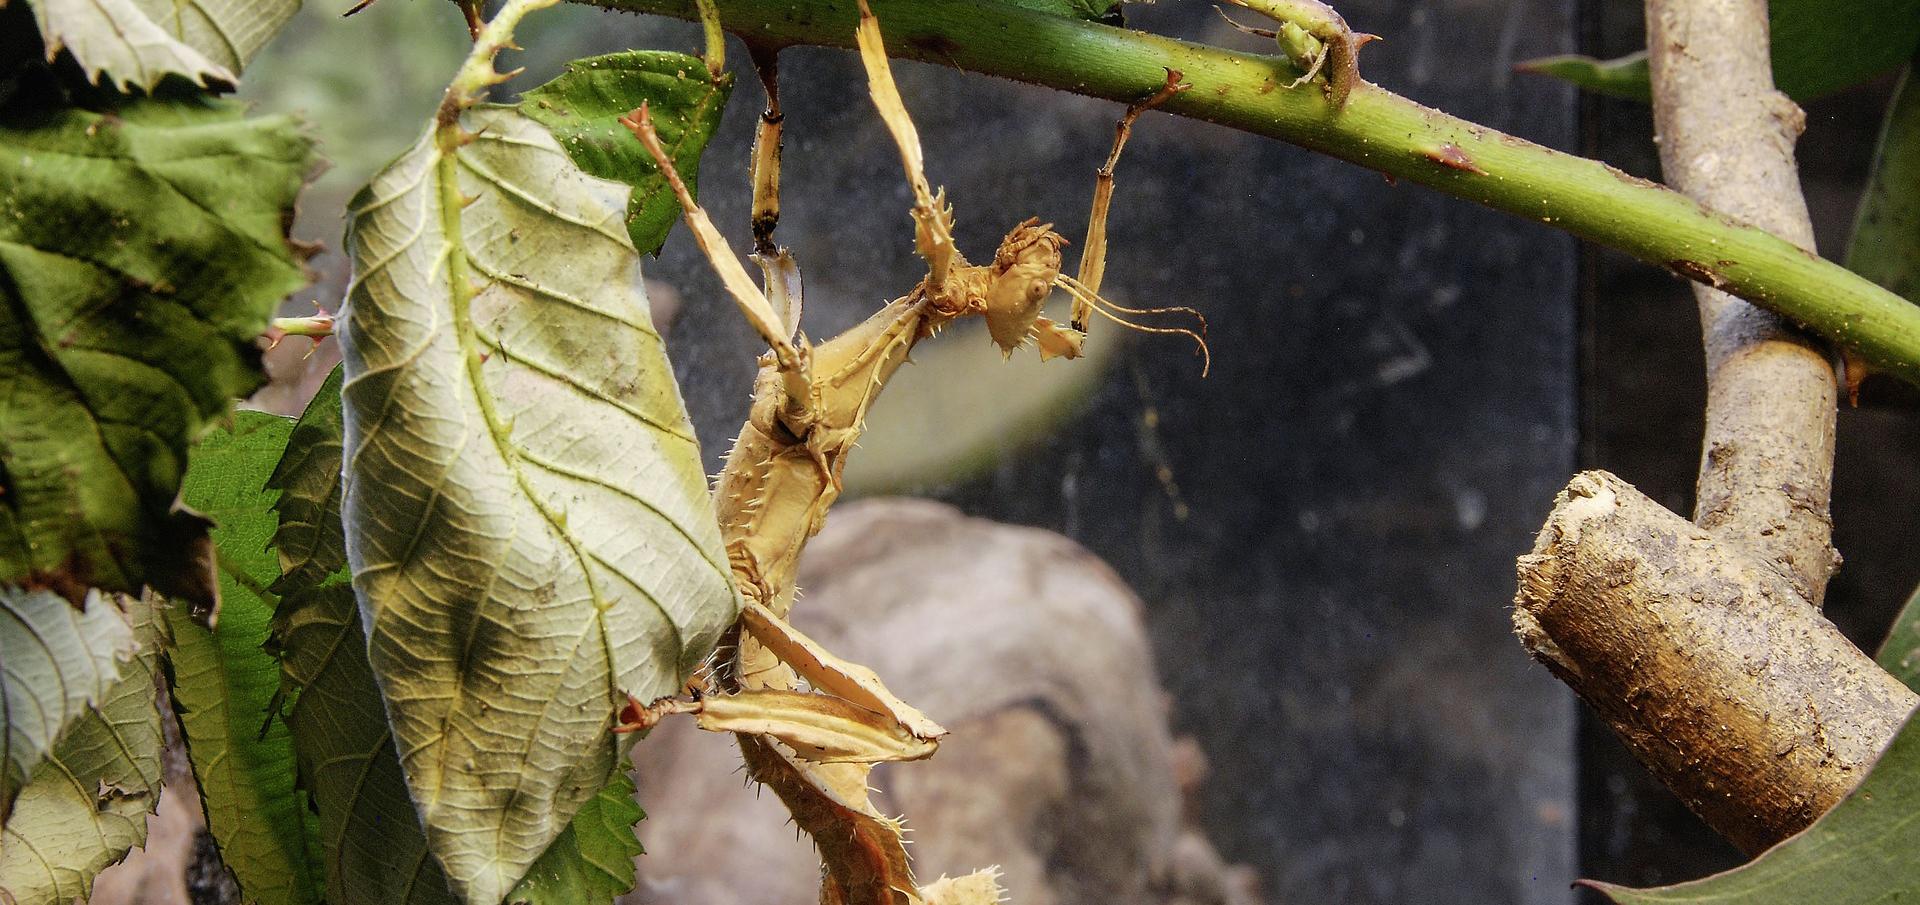 10 insectos raros que parecen criaturas extraterrestres